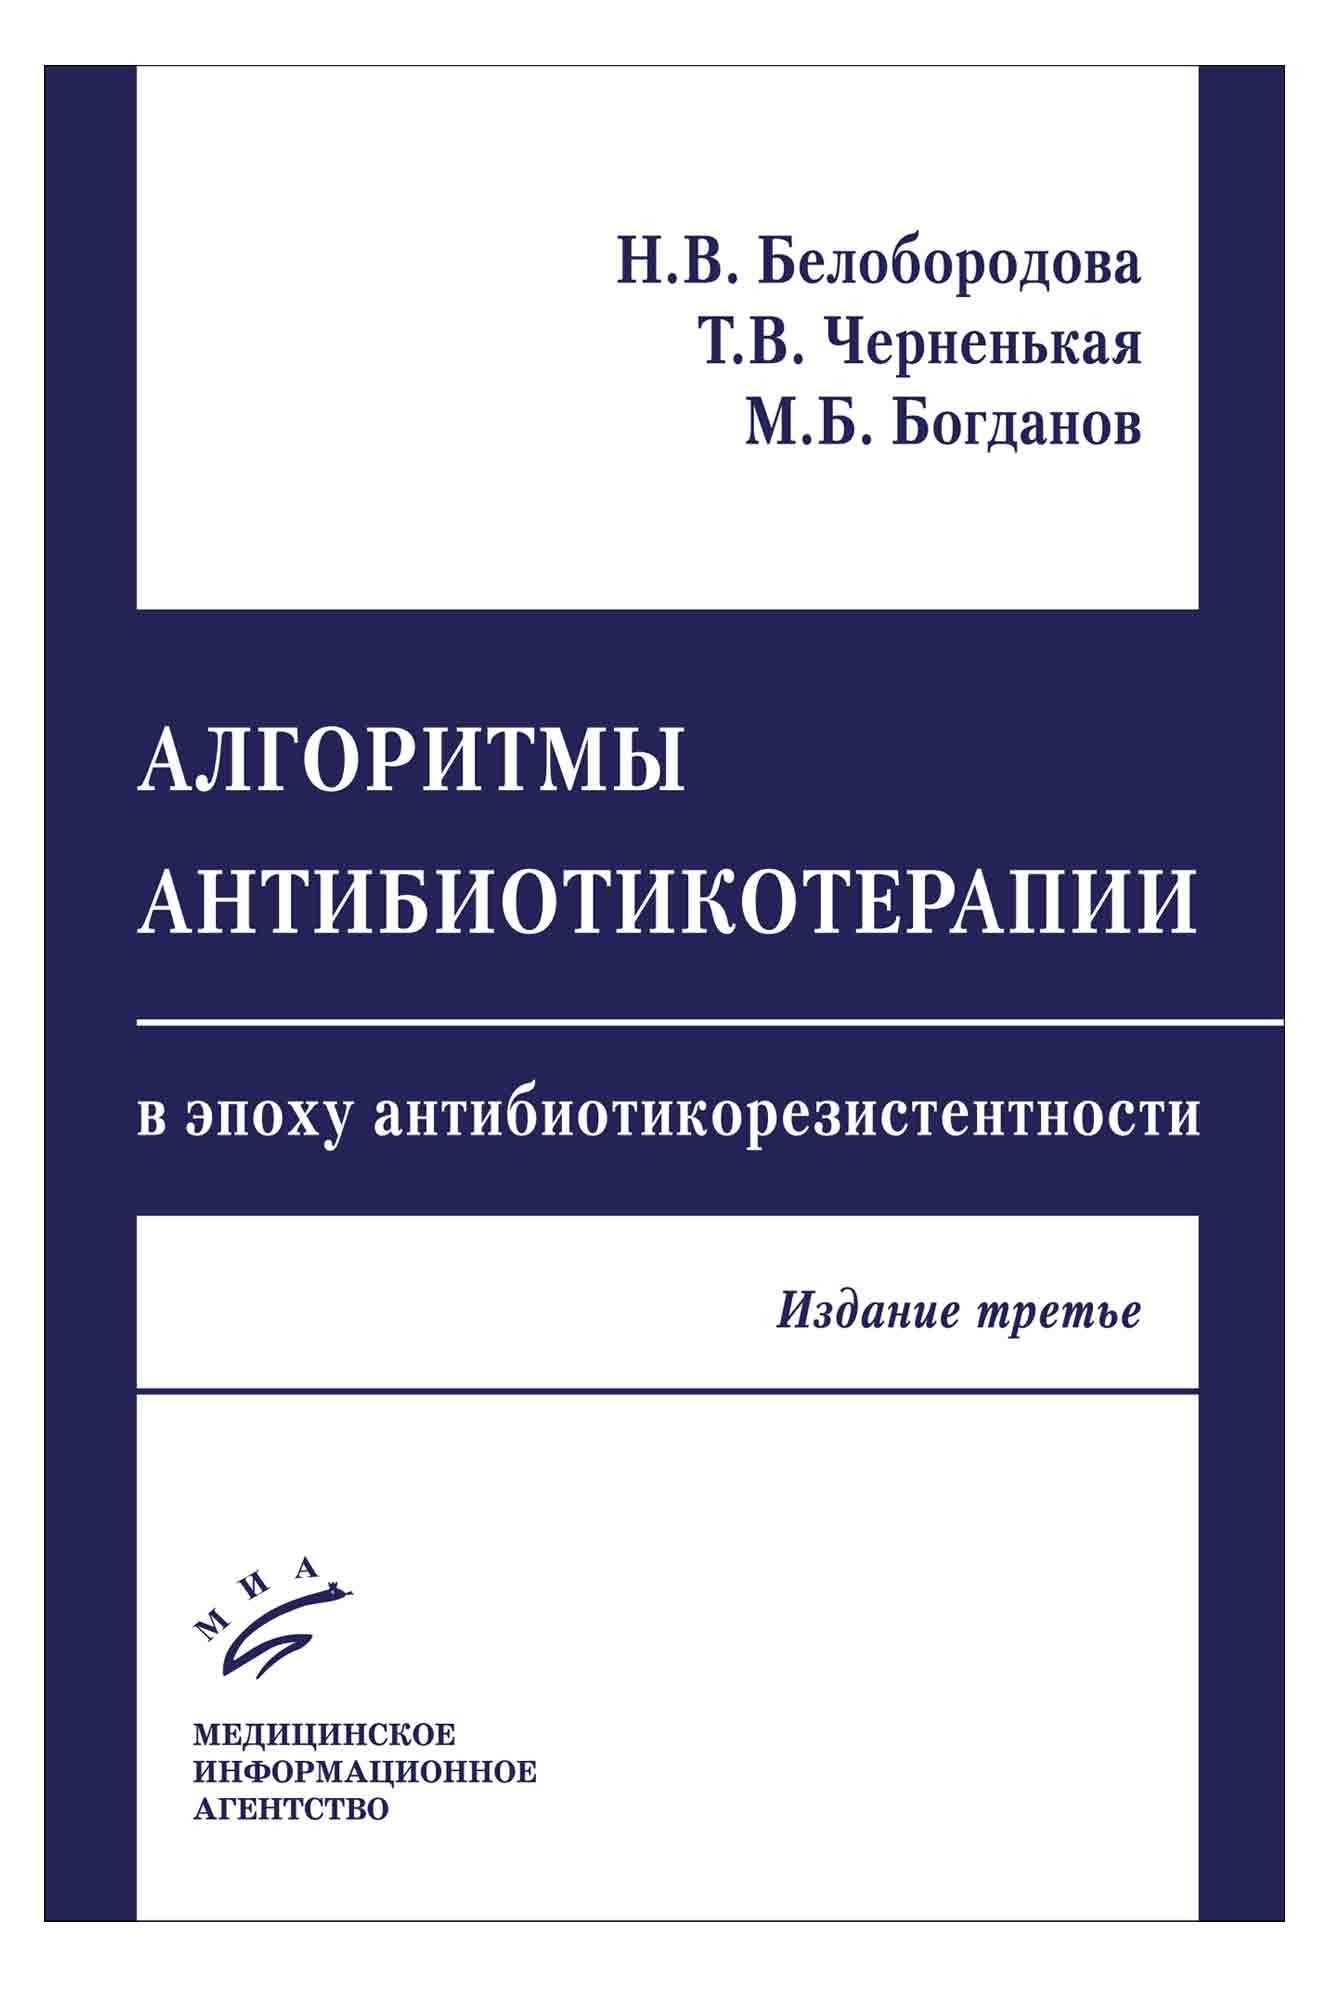 Каталог Алгоритмы антибиотикотерапии в эпоху антибиотикорезистентности algdia3.jpg